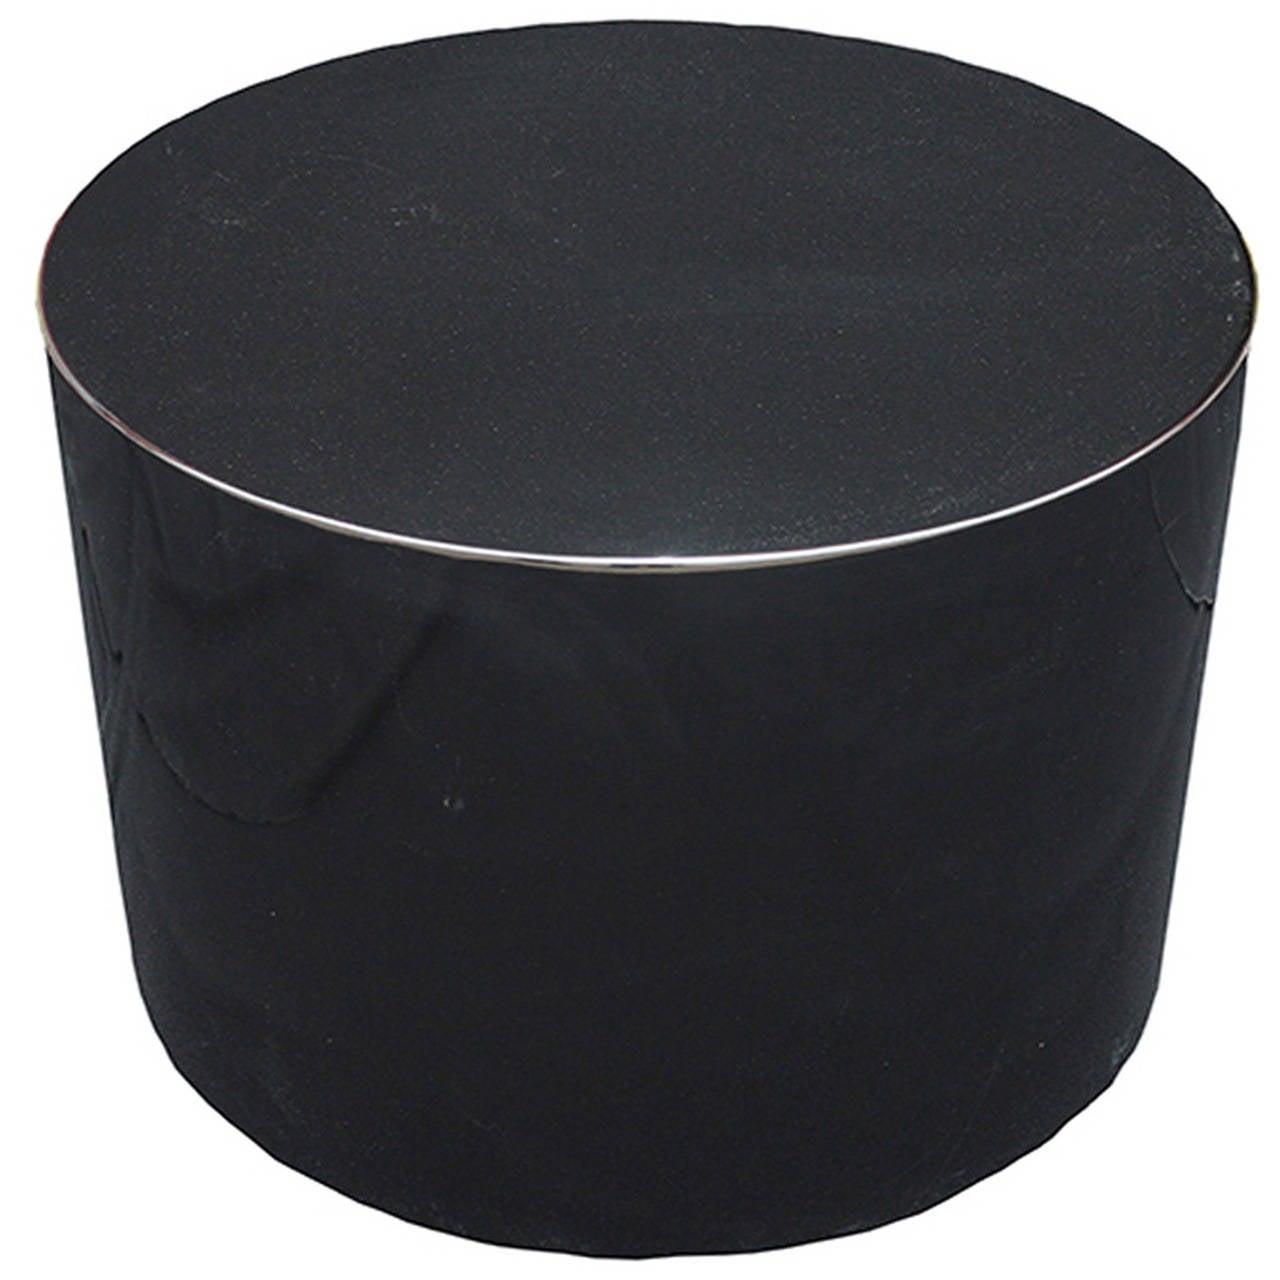 Karl Springer Style Swivel Black Lacquer Pedestal or Cocktail Table